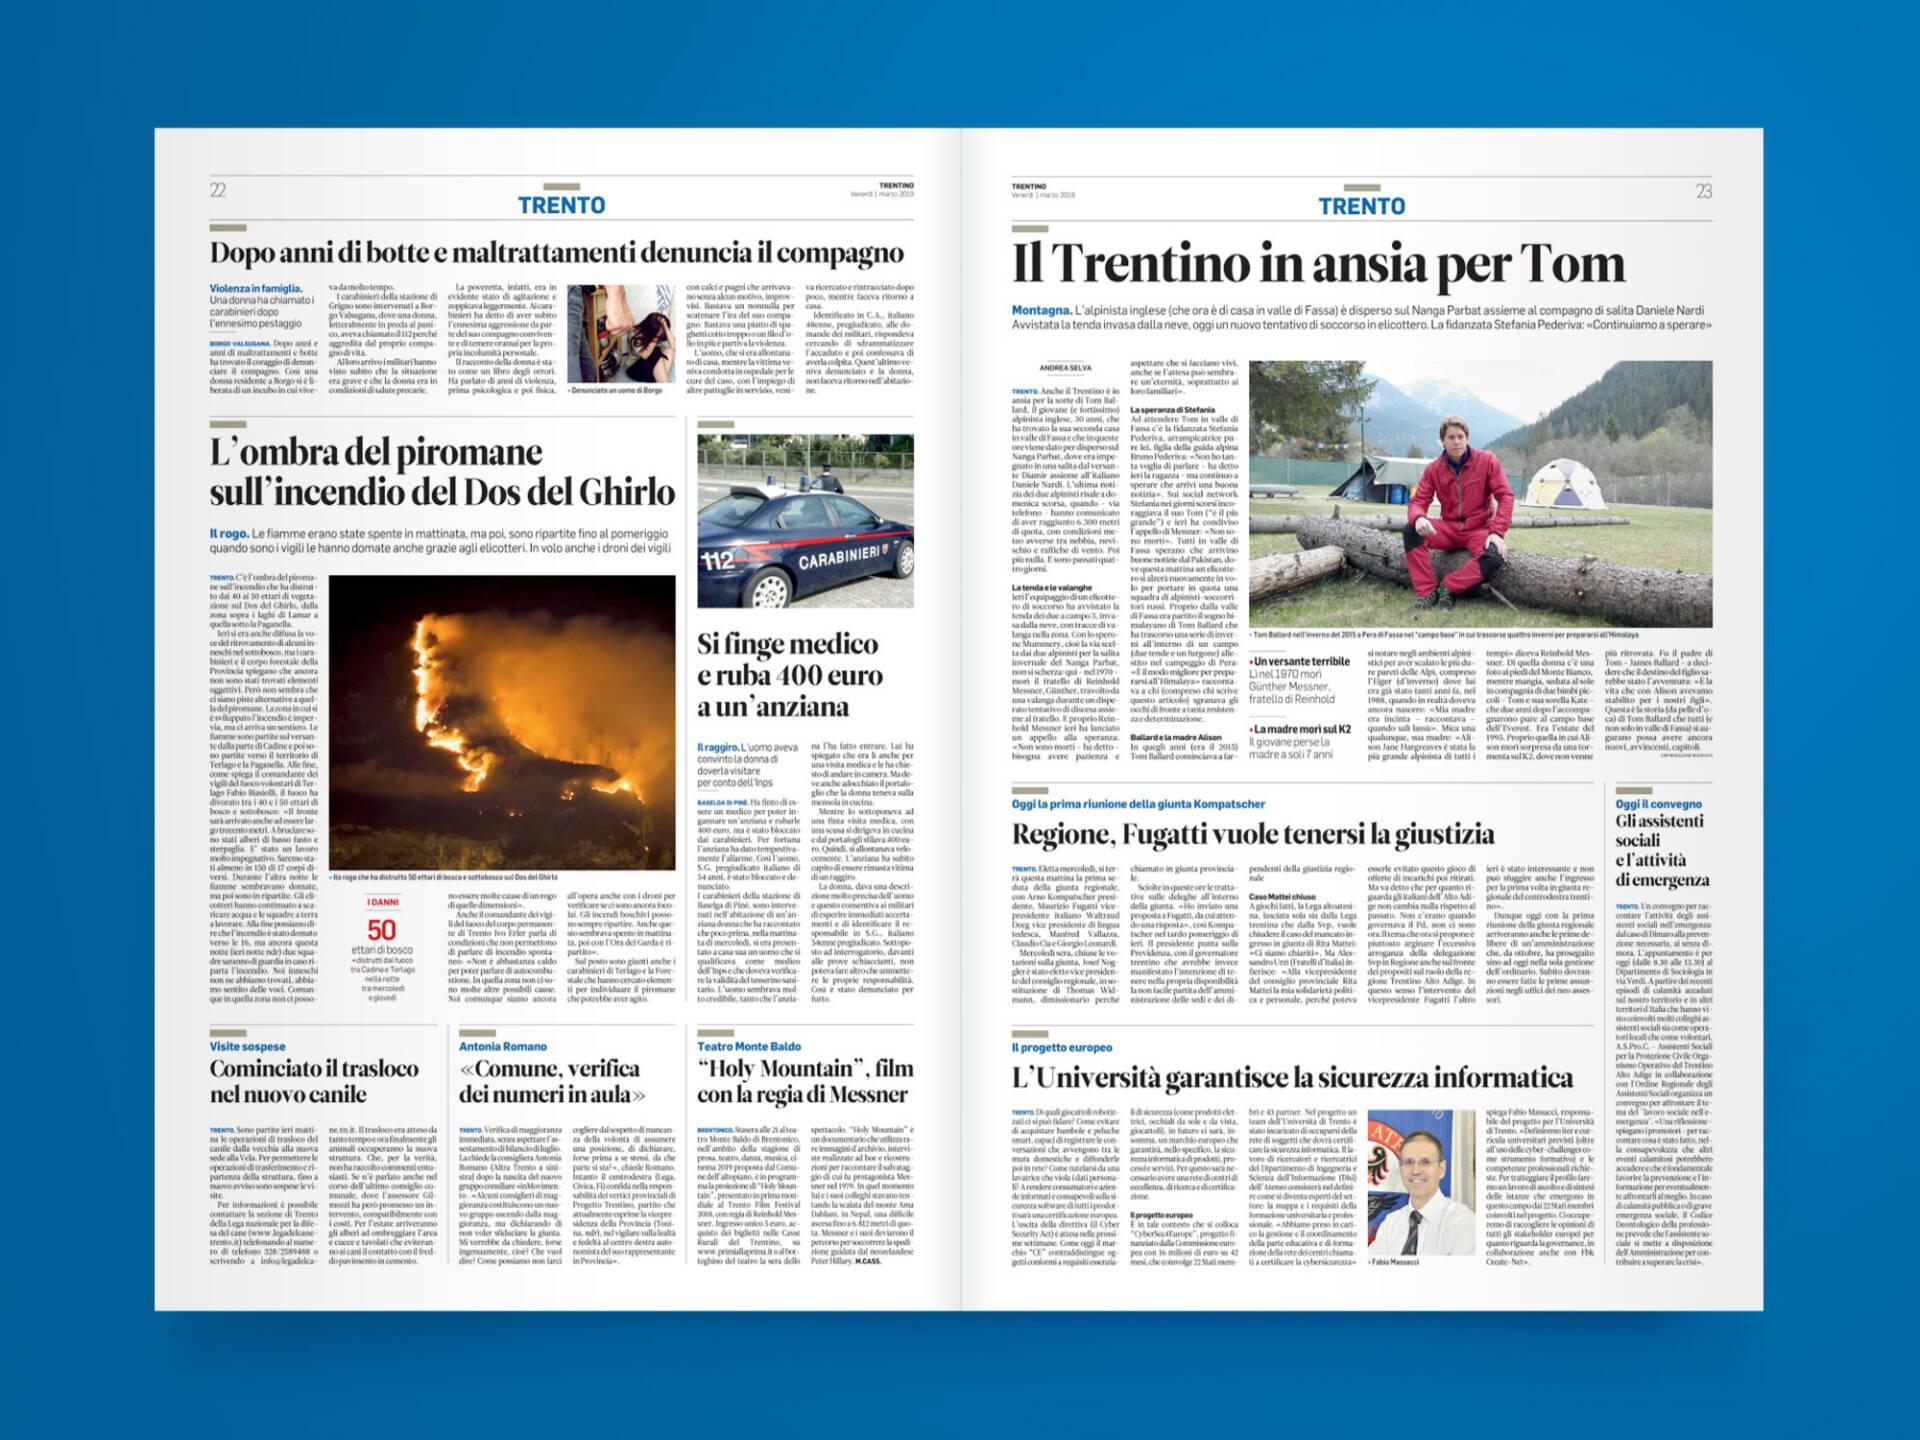 Trentino_03_Wenceslau_News_Design